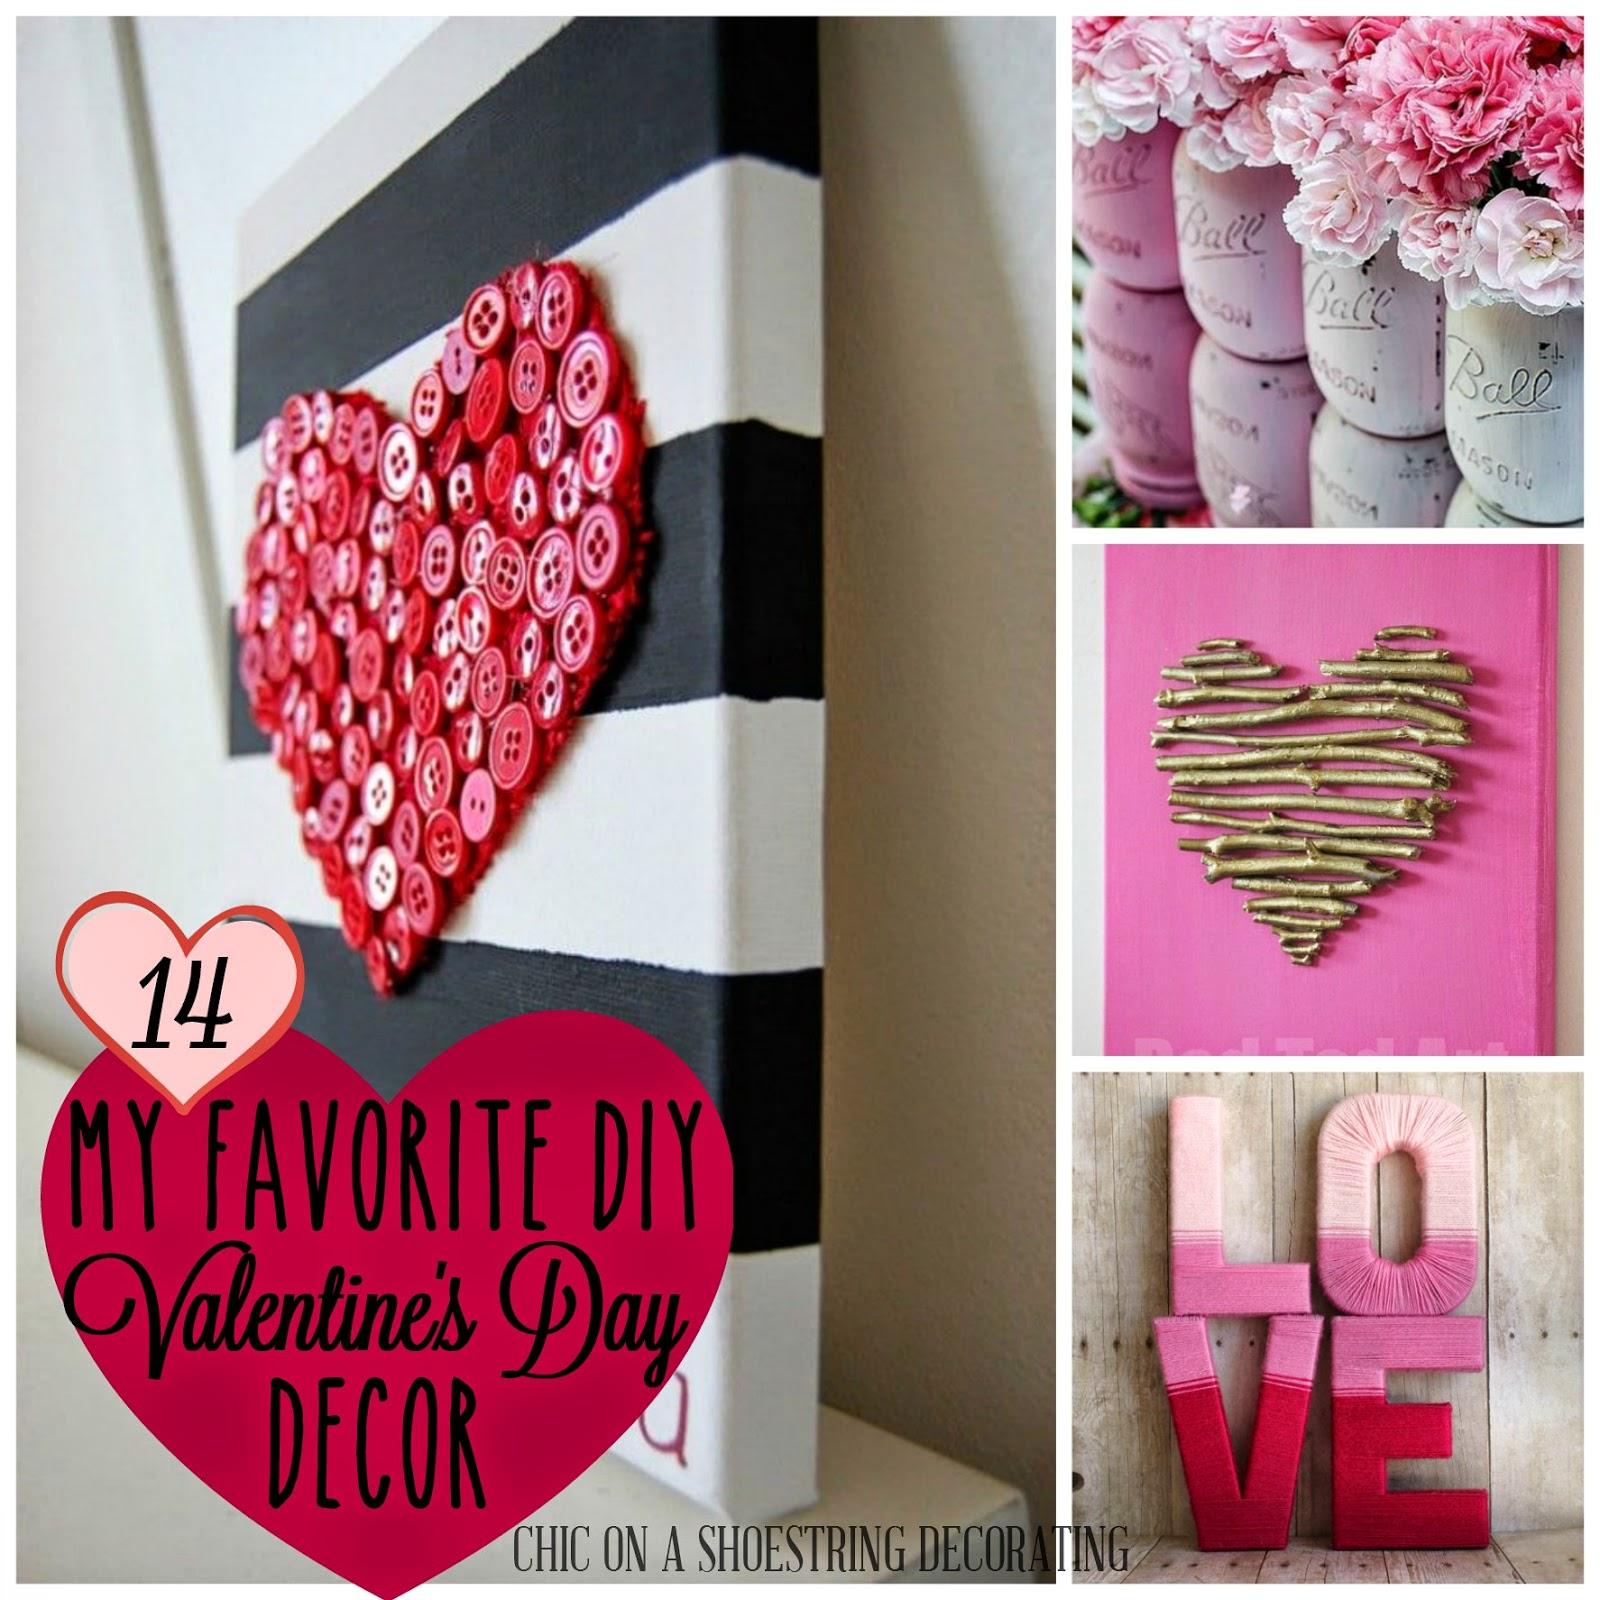 diy love letter valentines day dcor